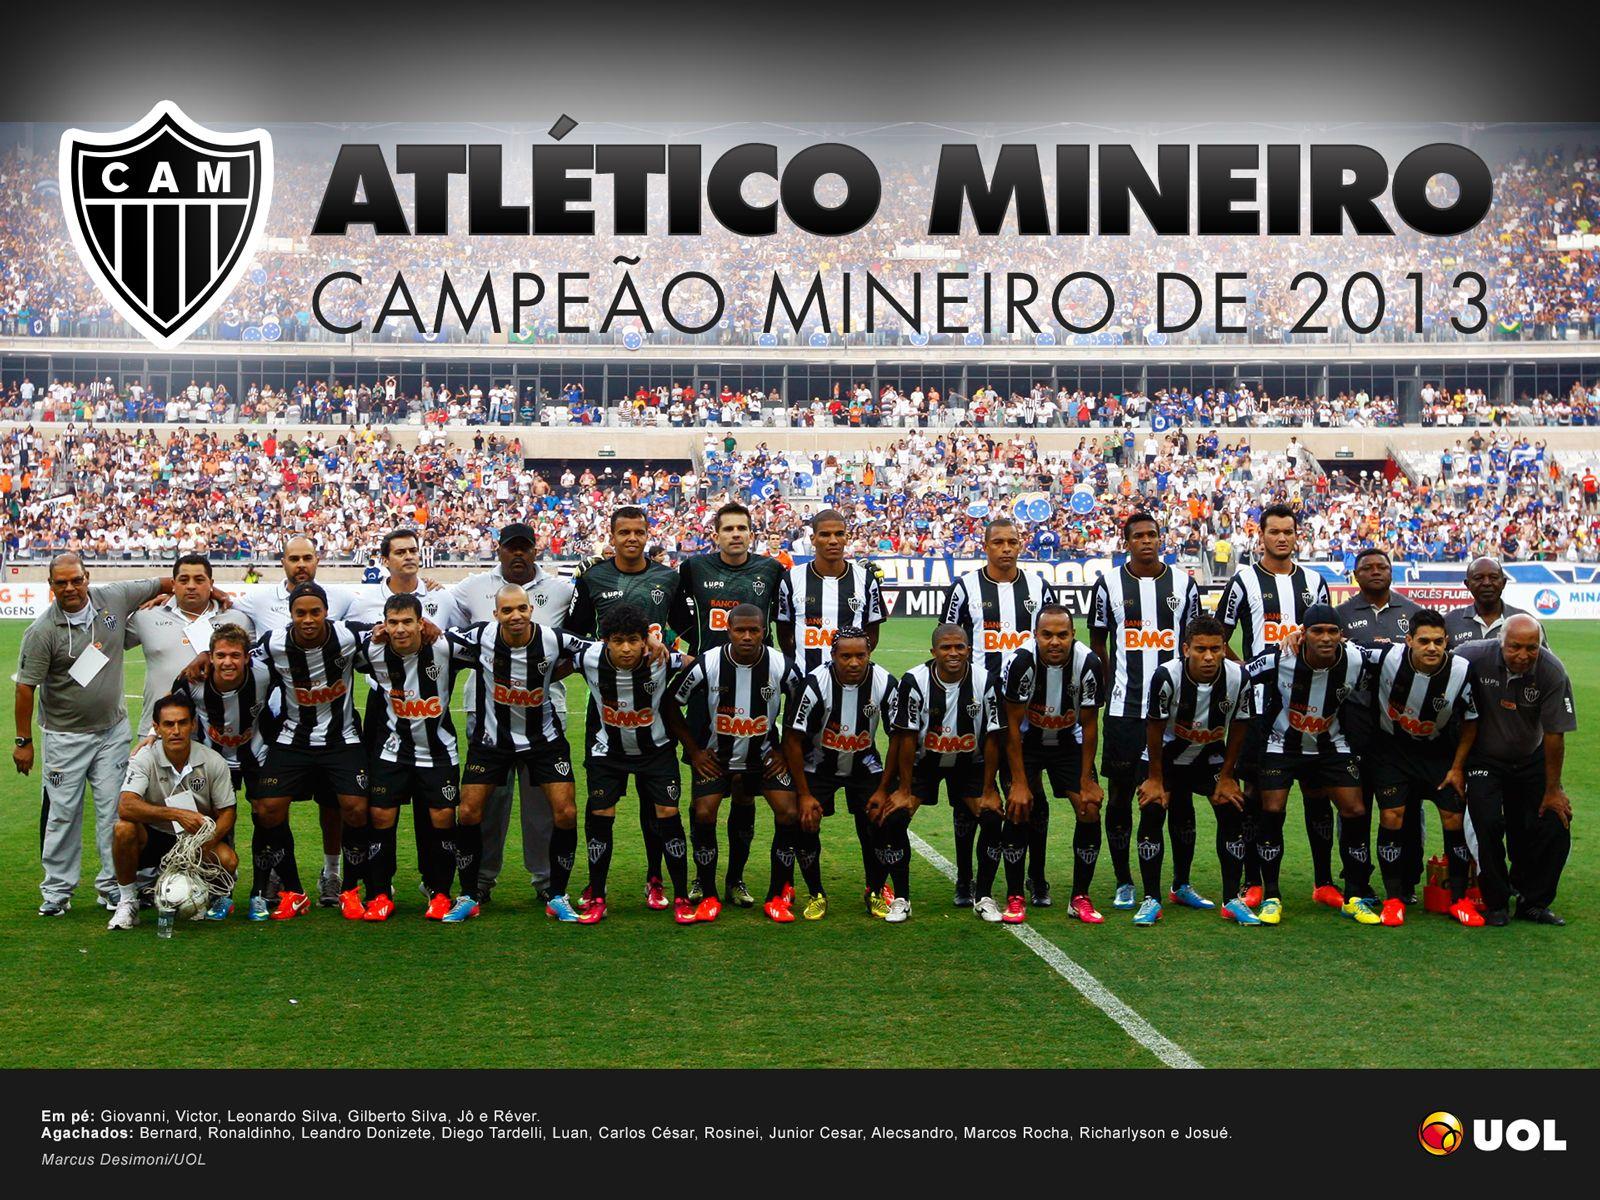 Bi Campeao Mineiro De 2012 13 Atletico Clube Atletico Mineiro Atletico Mg